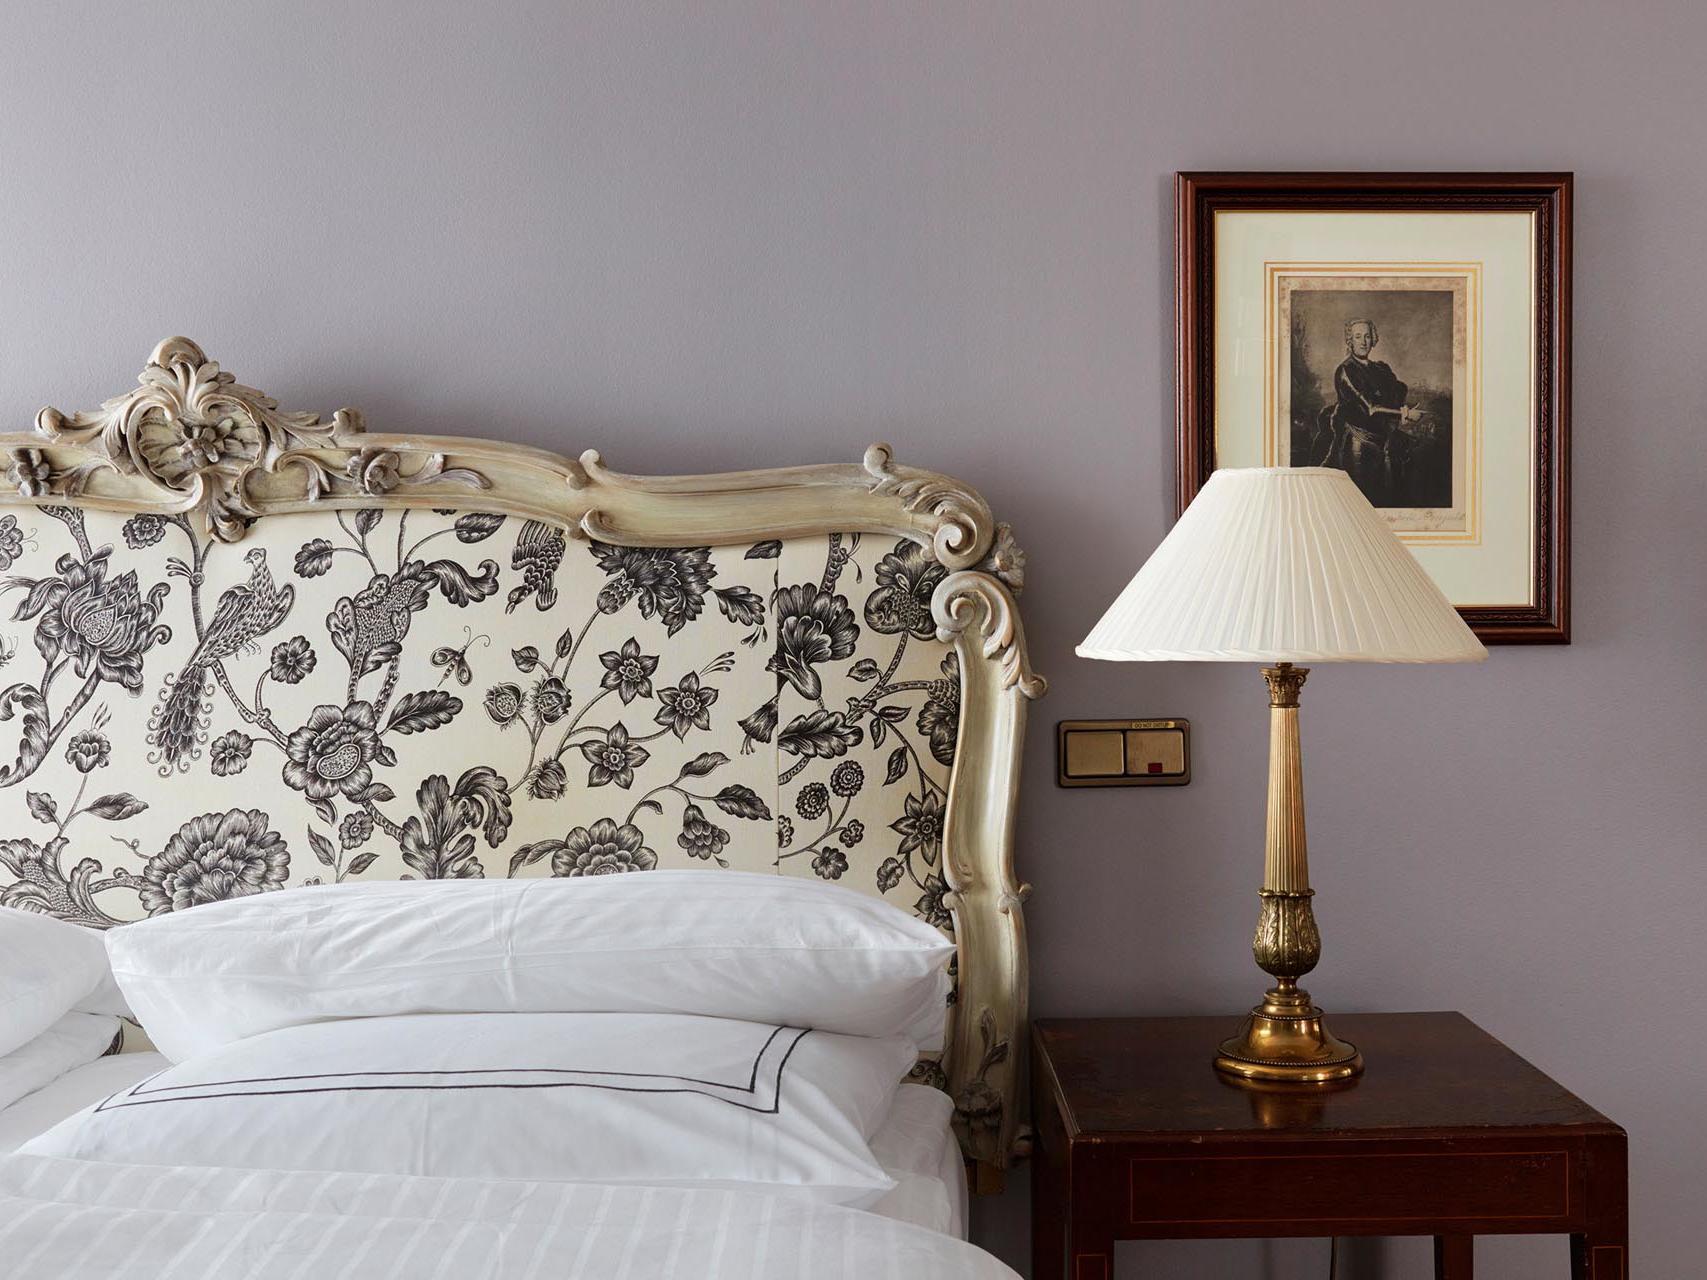 King Grand Deluxe Bedroom at Patrick Hellman Schlosshotel